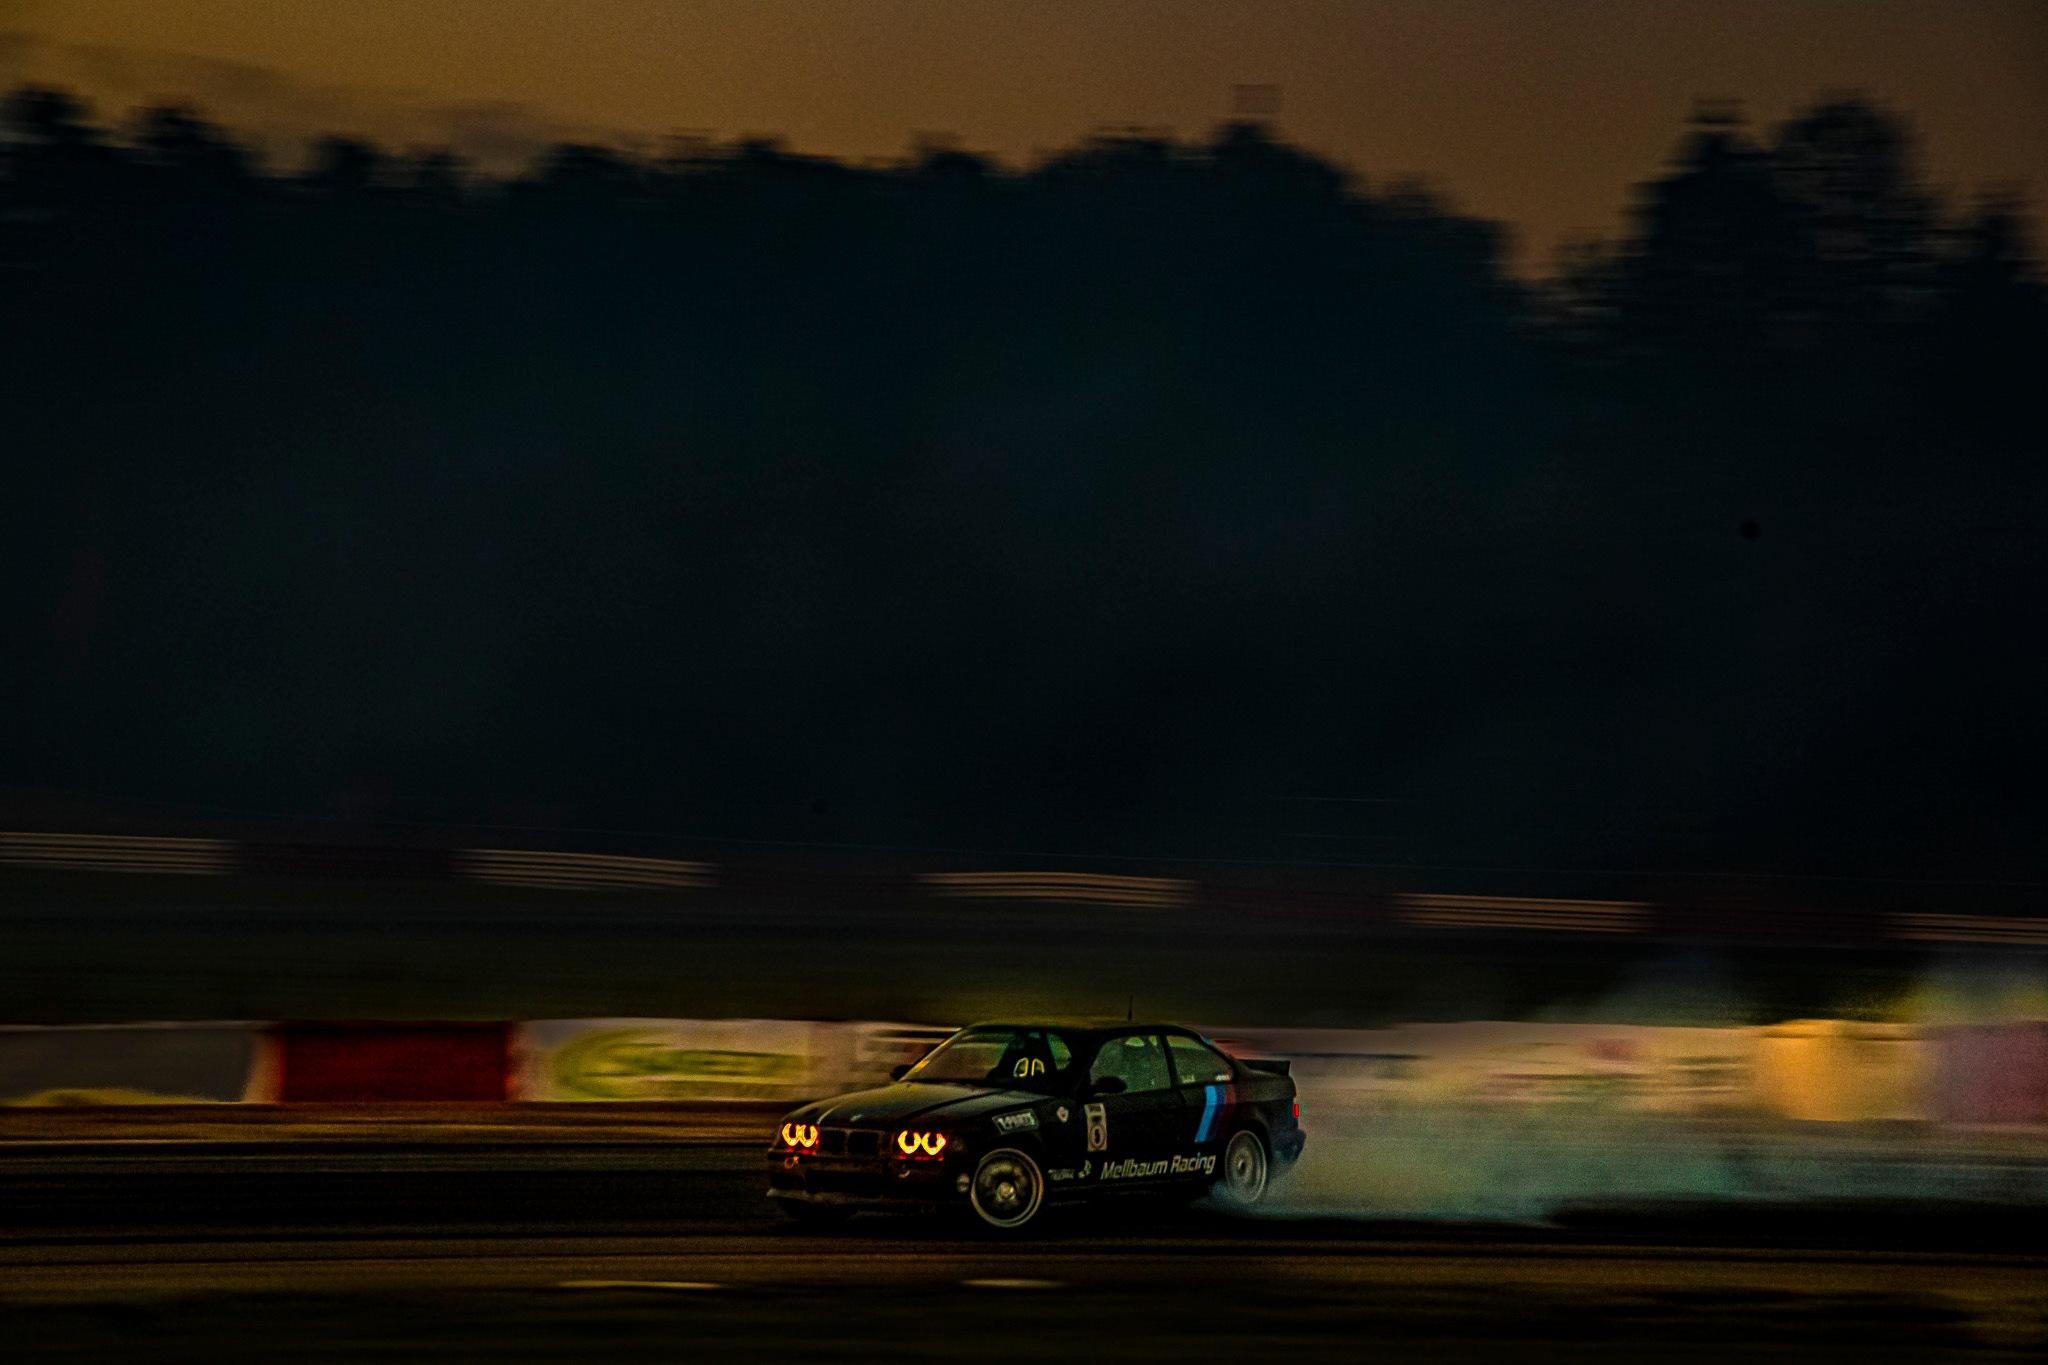 E30 drifting by Jonas Hermansson